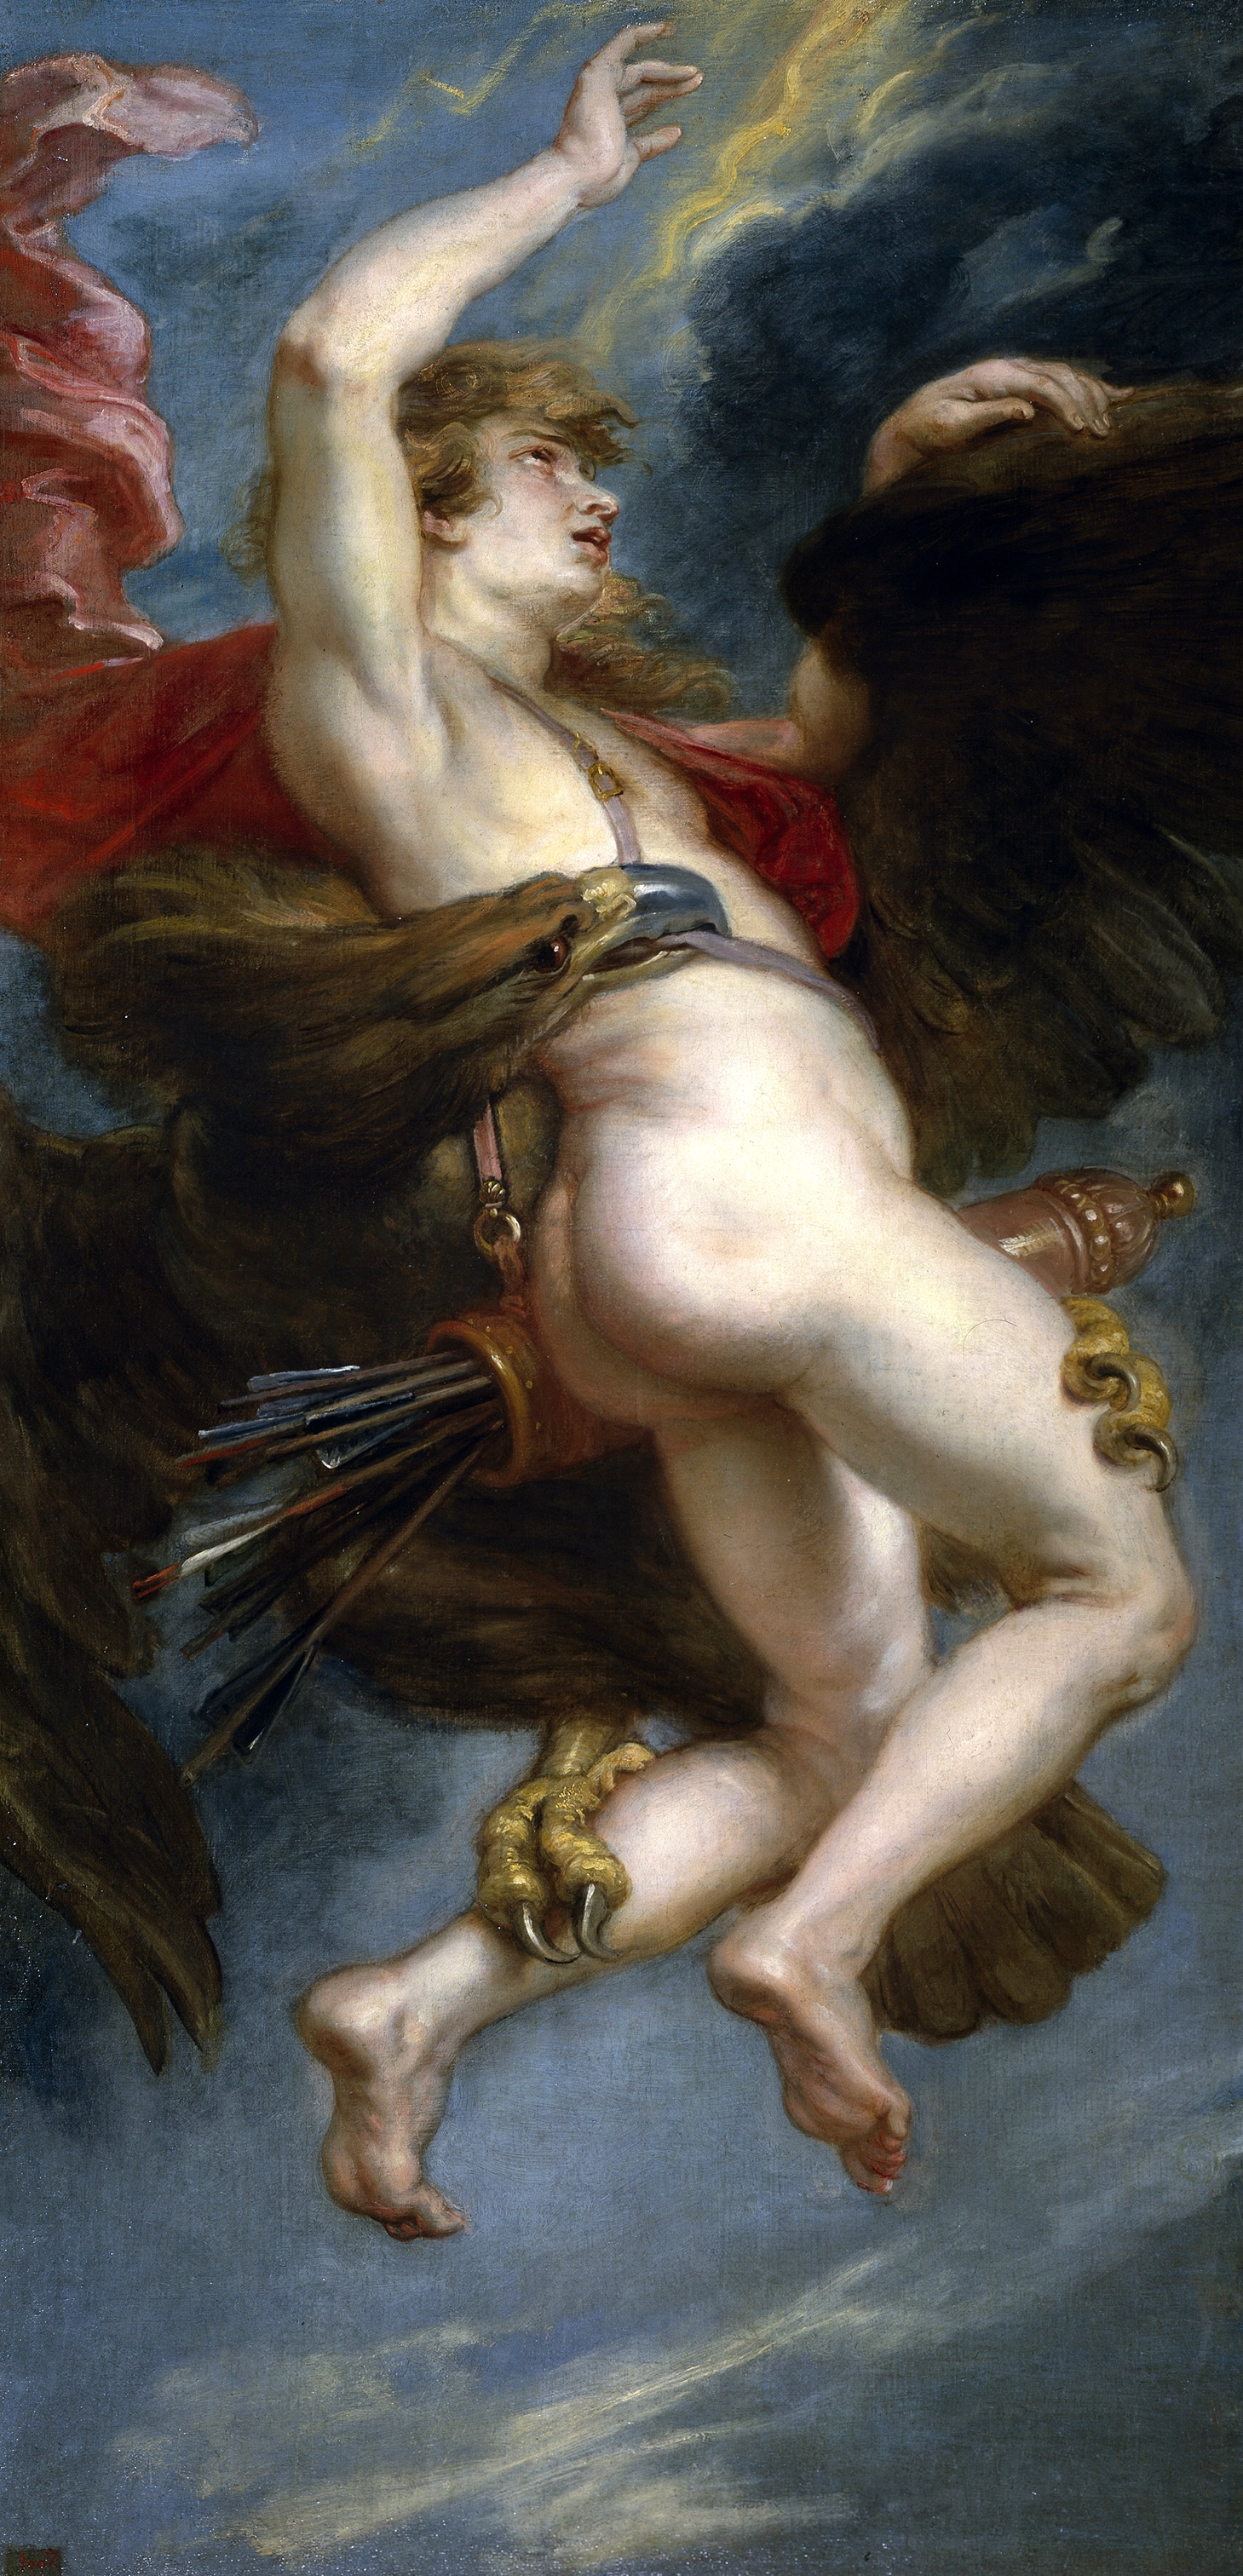 El rapto de Ganímedes 1636 - 1638. Óleo sobre lienzo, 181 x 87,3 cm.